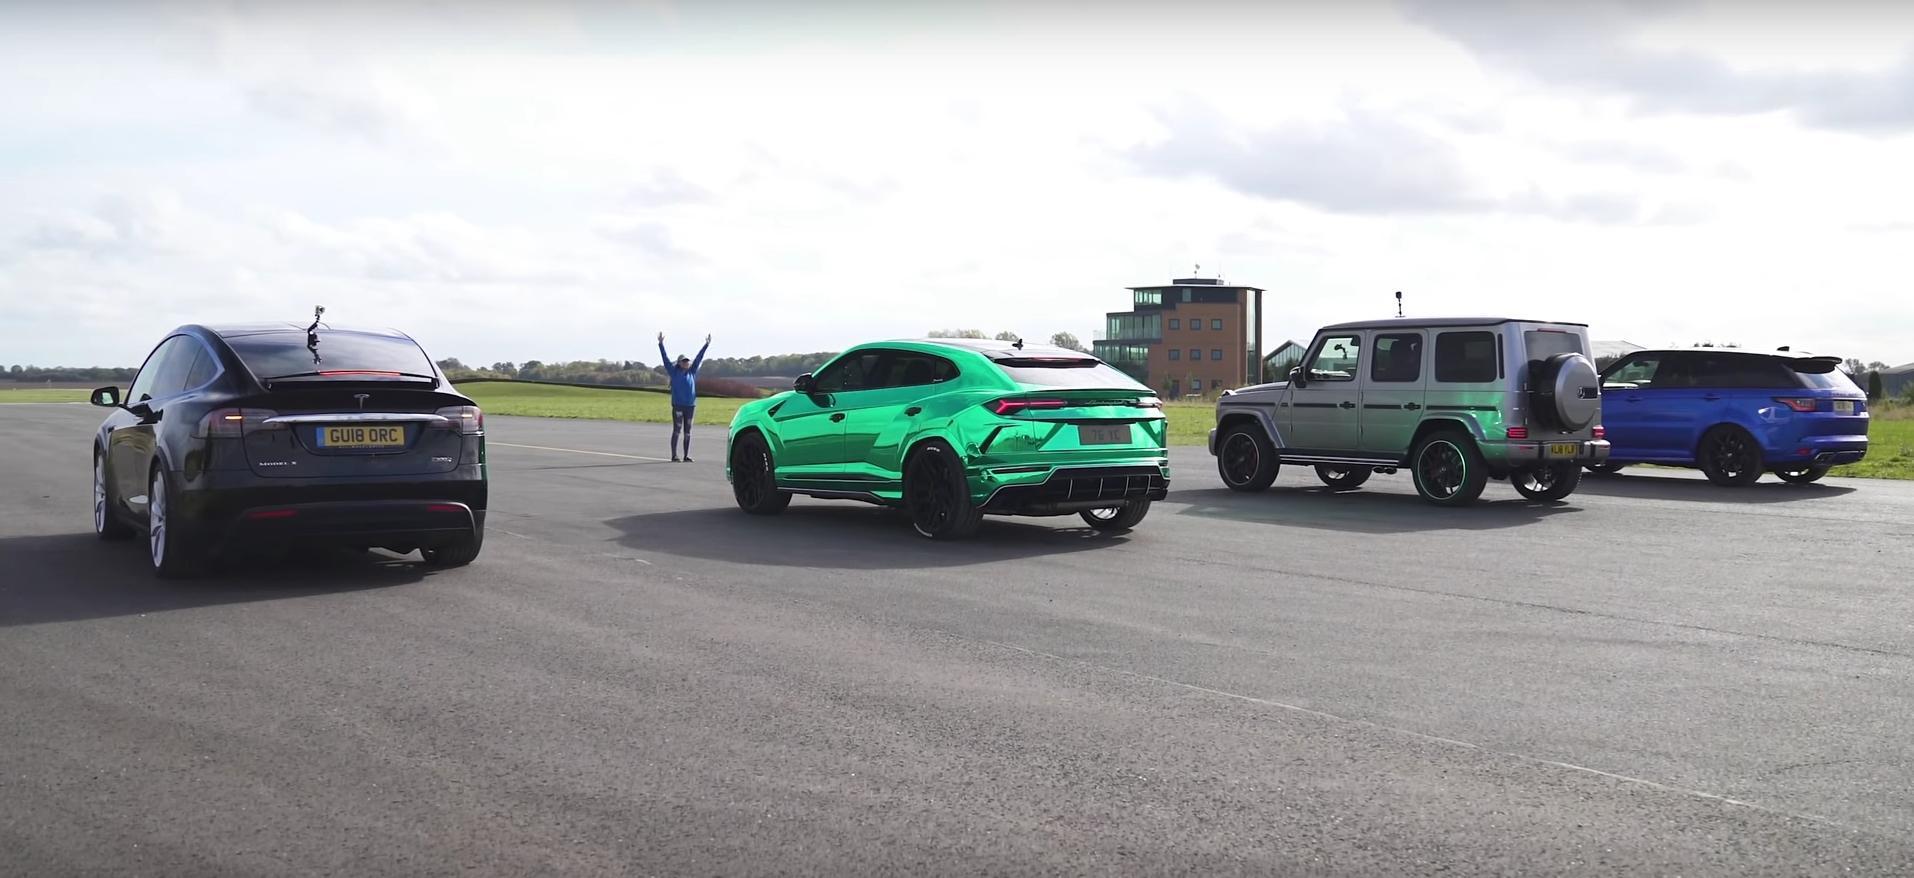 Tesla Model X humbles Lamborghini Urus and Mercedes,AMG G63